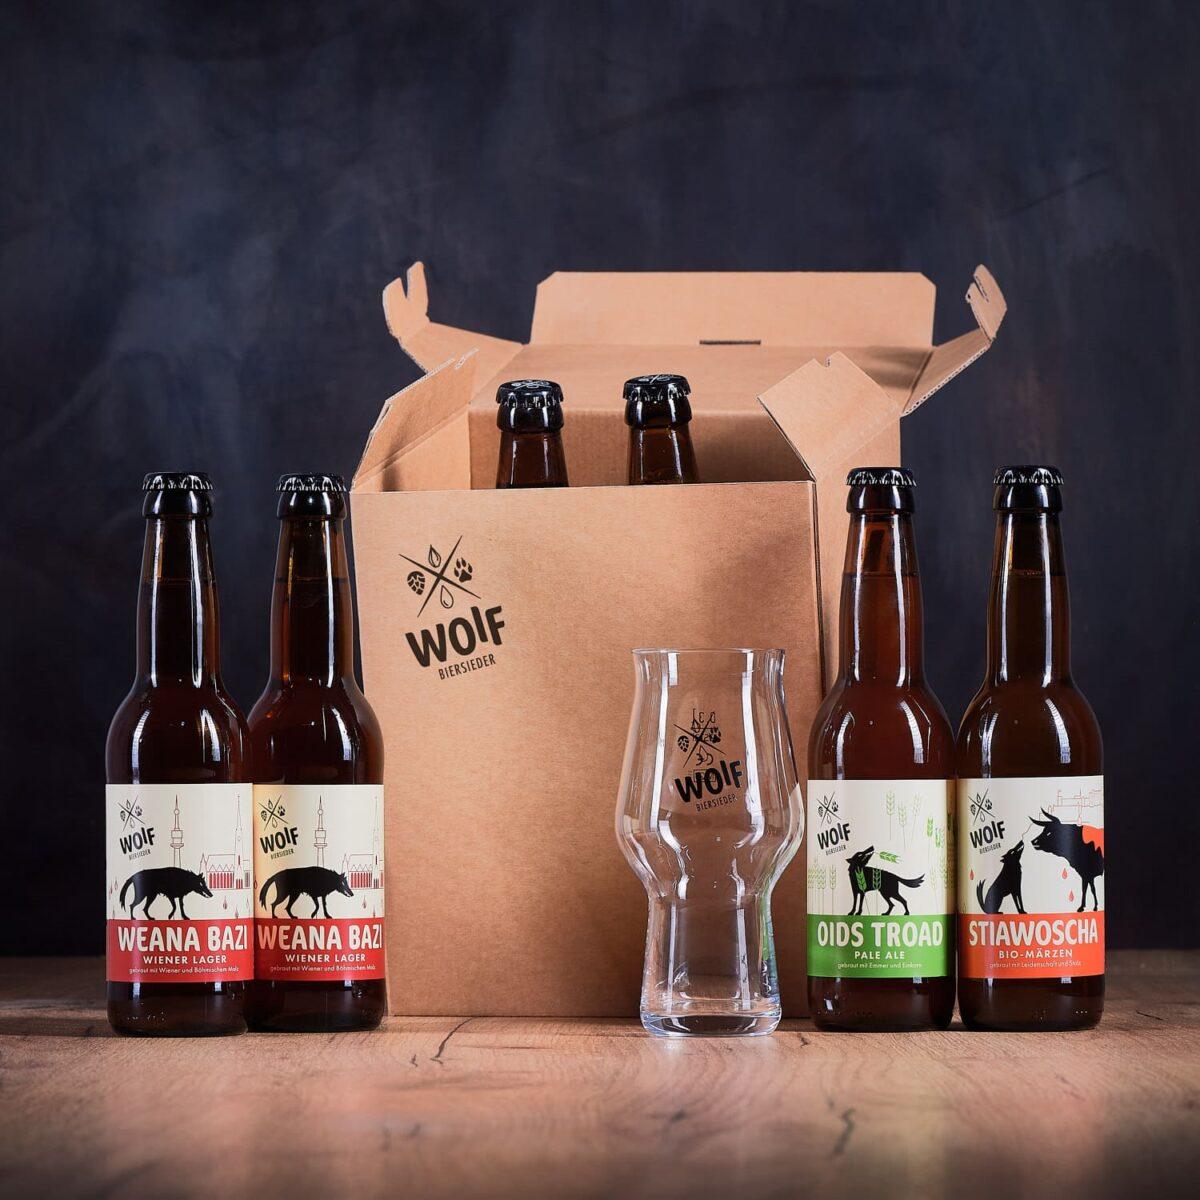 Woif Bier Box - 7+1